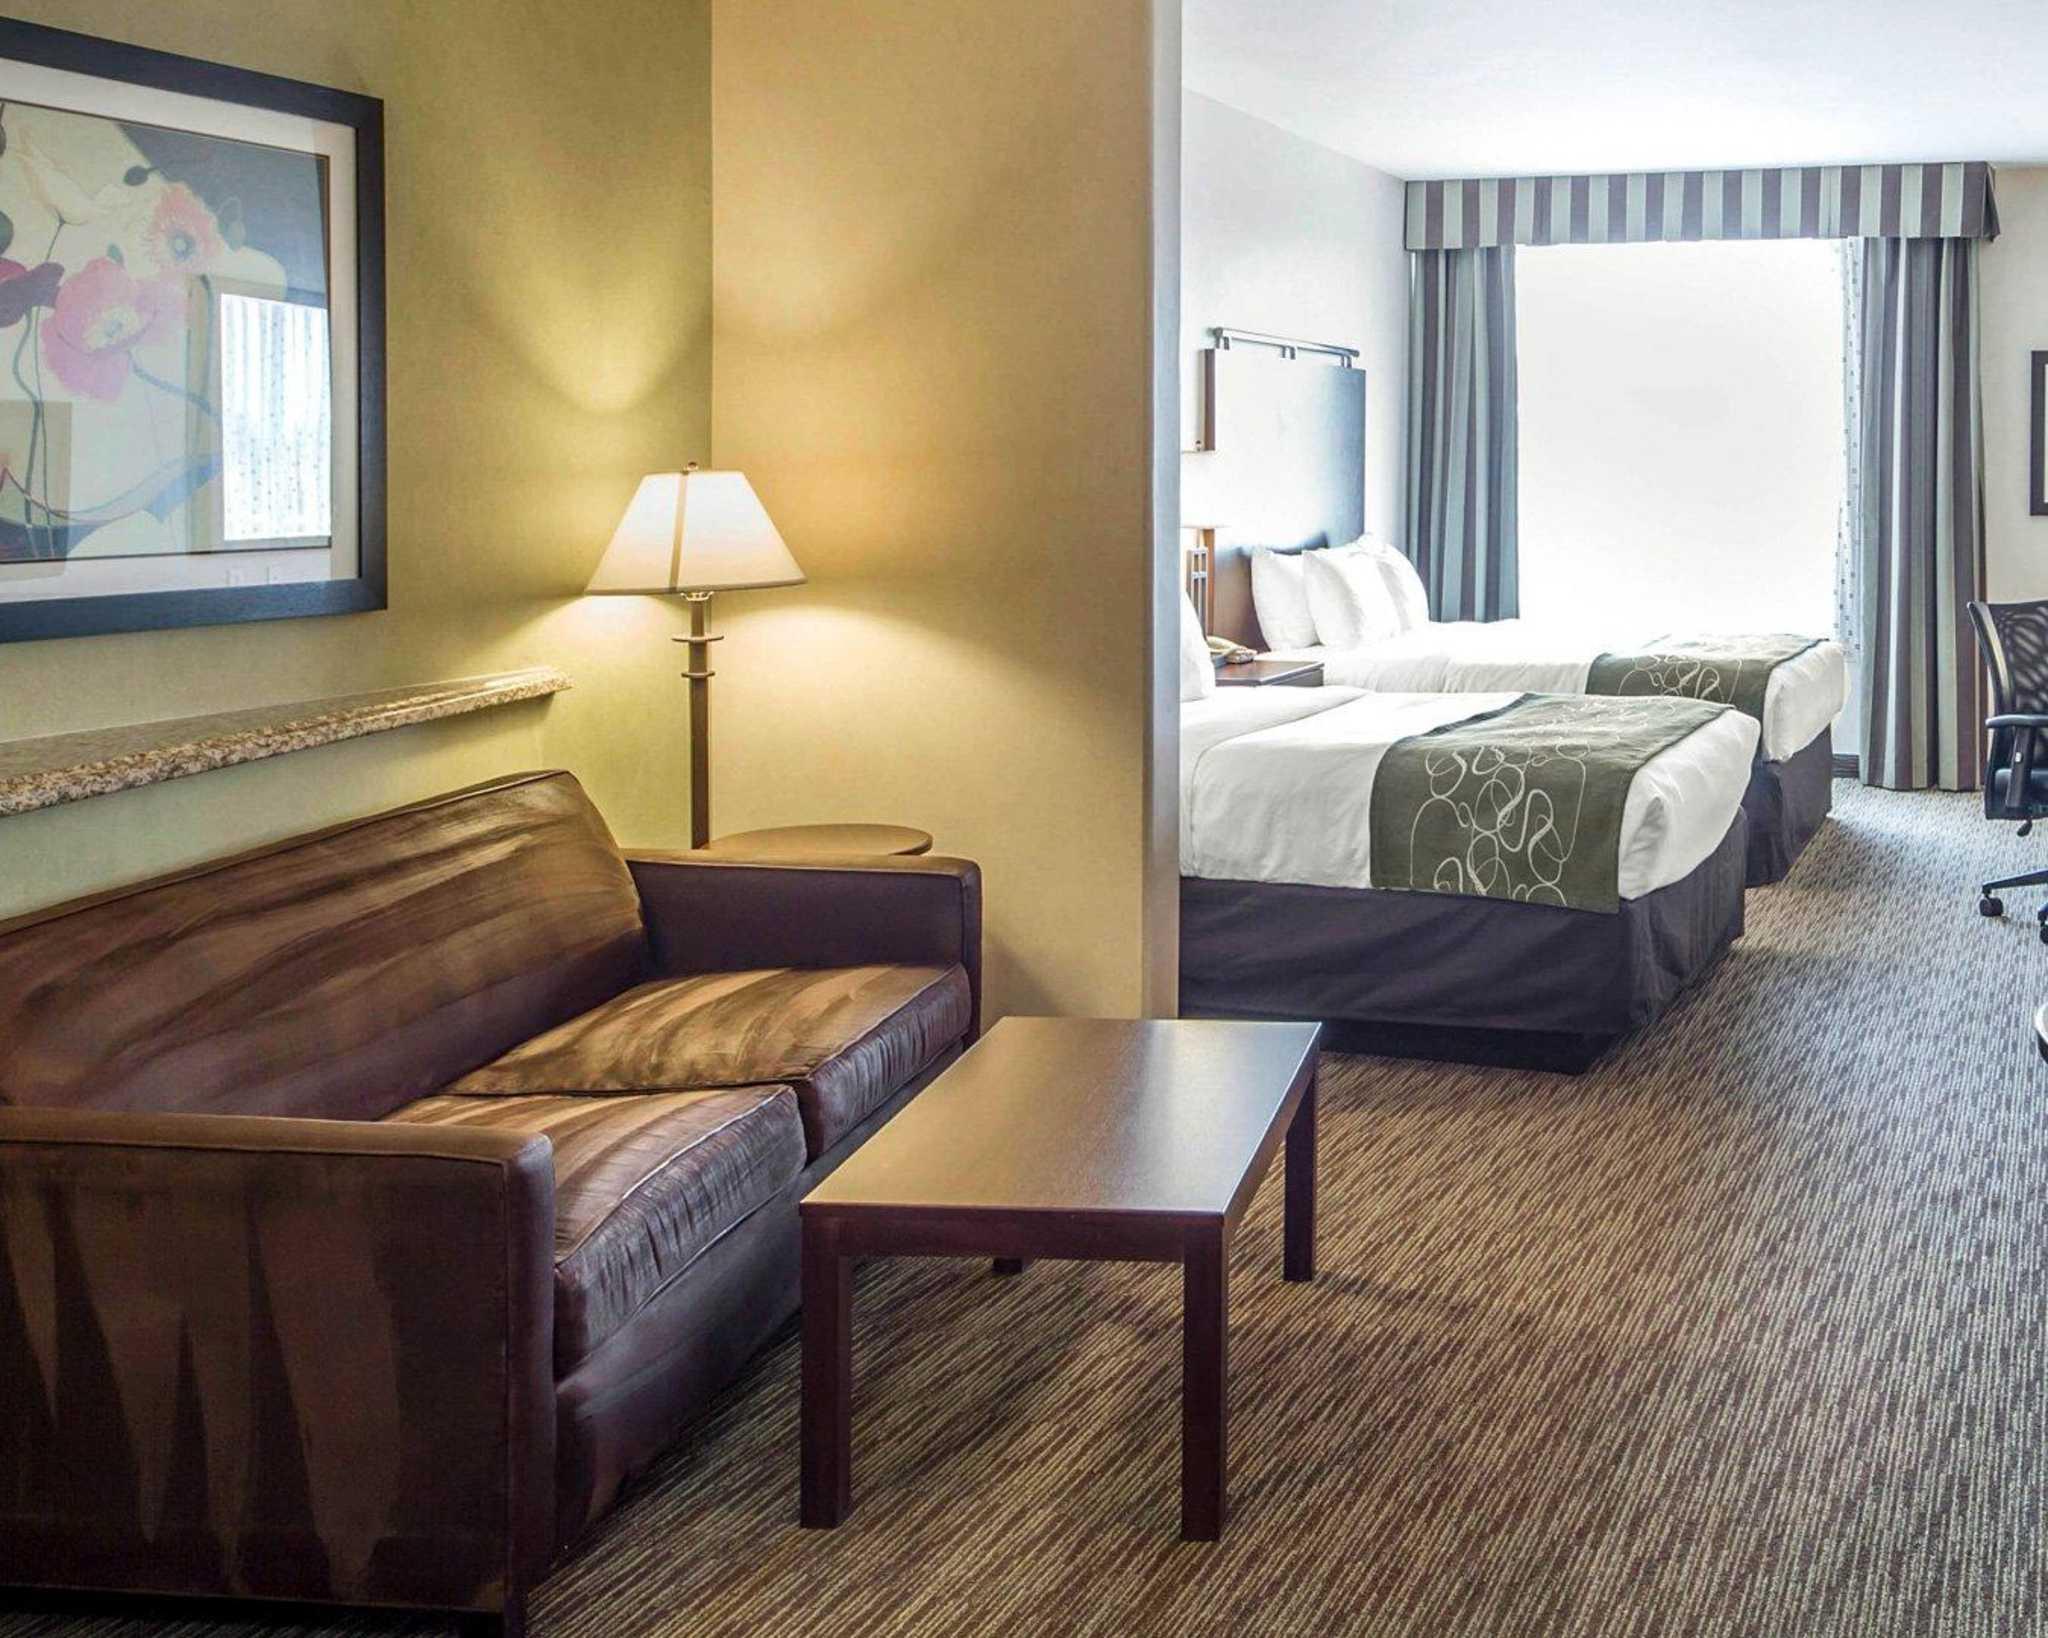 Hotel Rooms In Turlock Ca